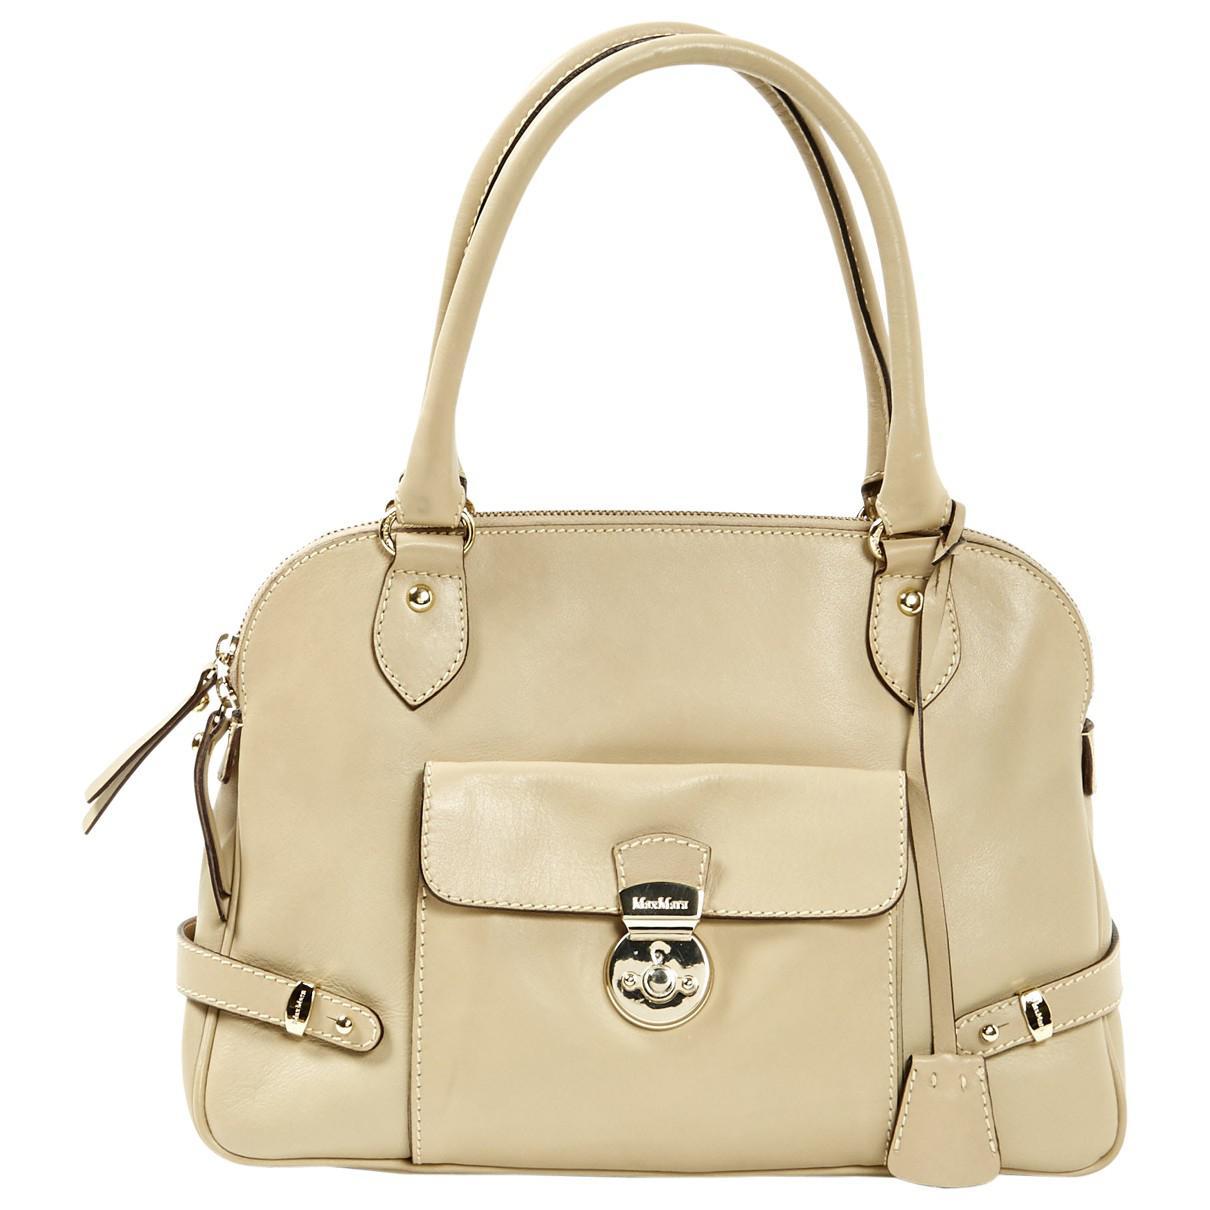 Max Mara Pre-owned - Leather handbag 1xoLnefy4v